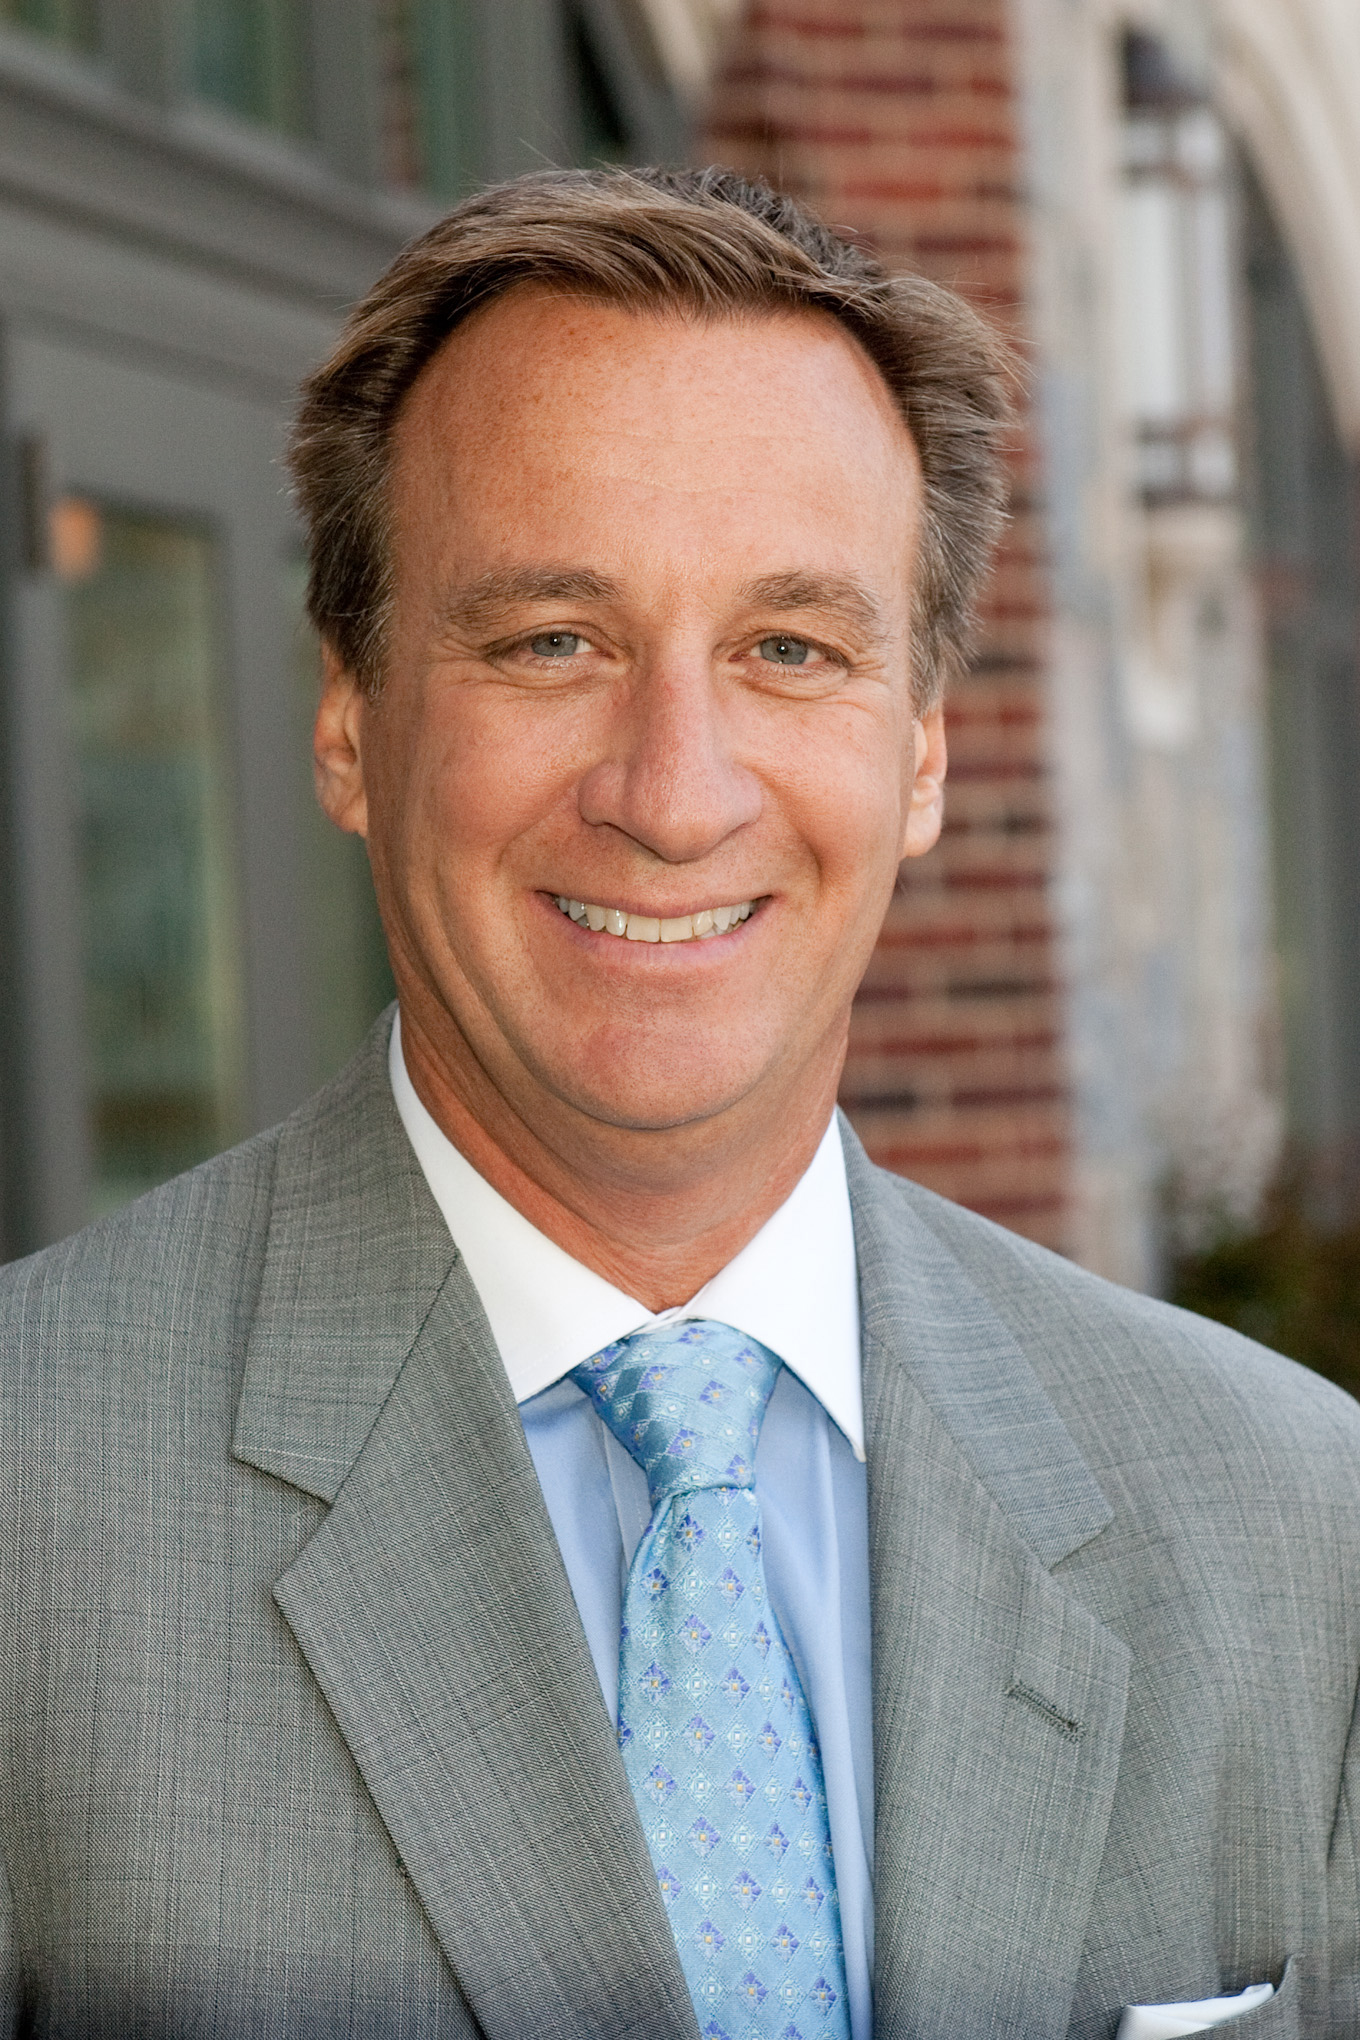 Joseph T. Kirchhoff, founder of Kirchhoff Companies